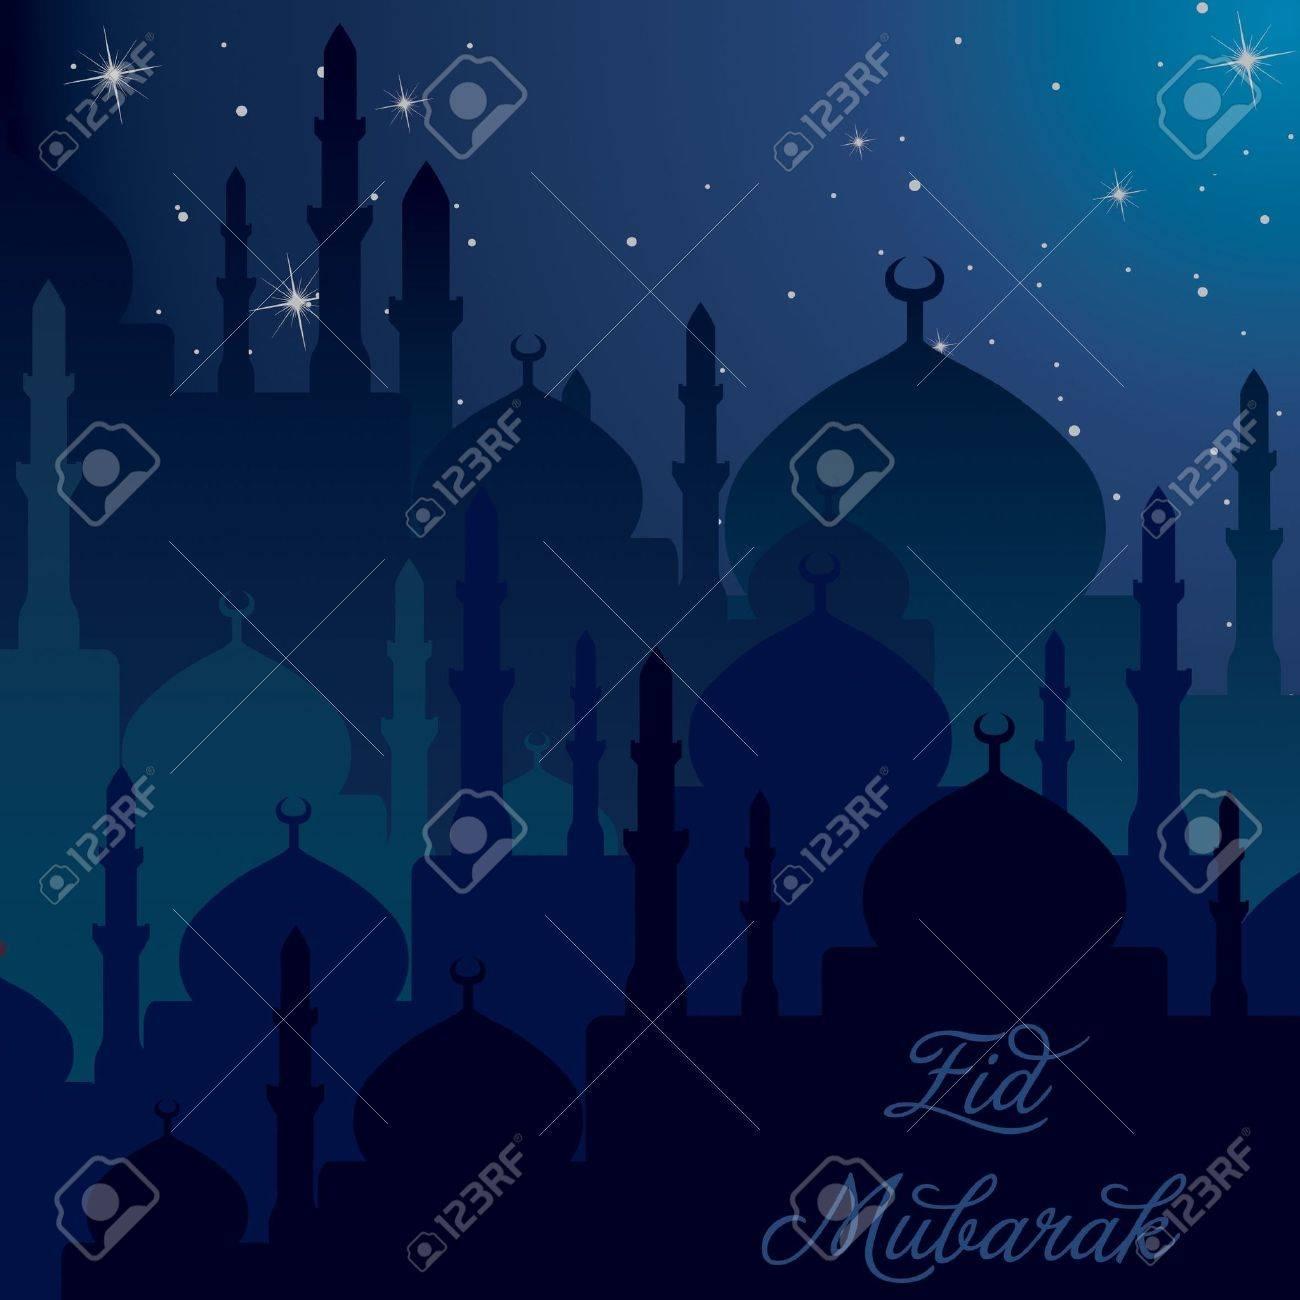 Dusk Mosques Eid Mubarak  Blessed Eid  card in vector format Stock Vector - 19644486